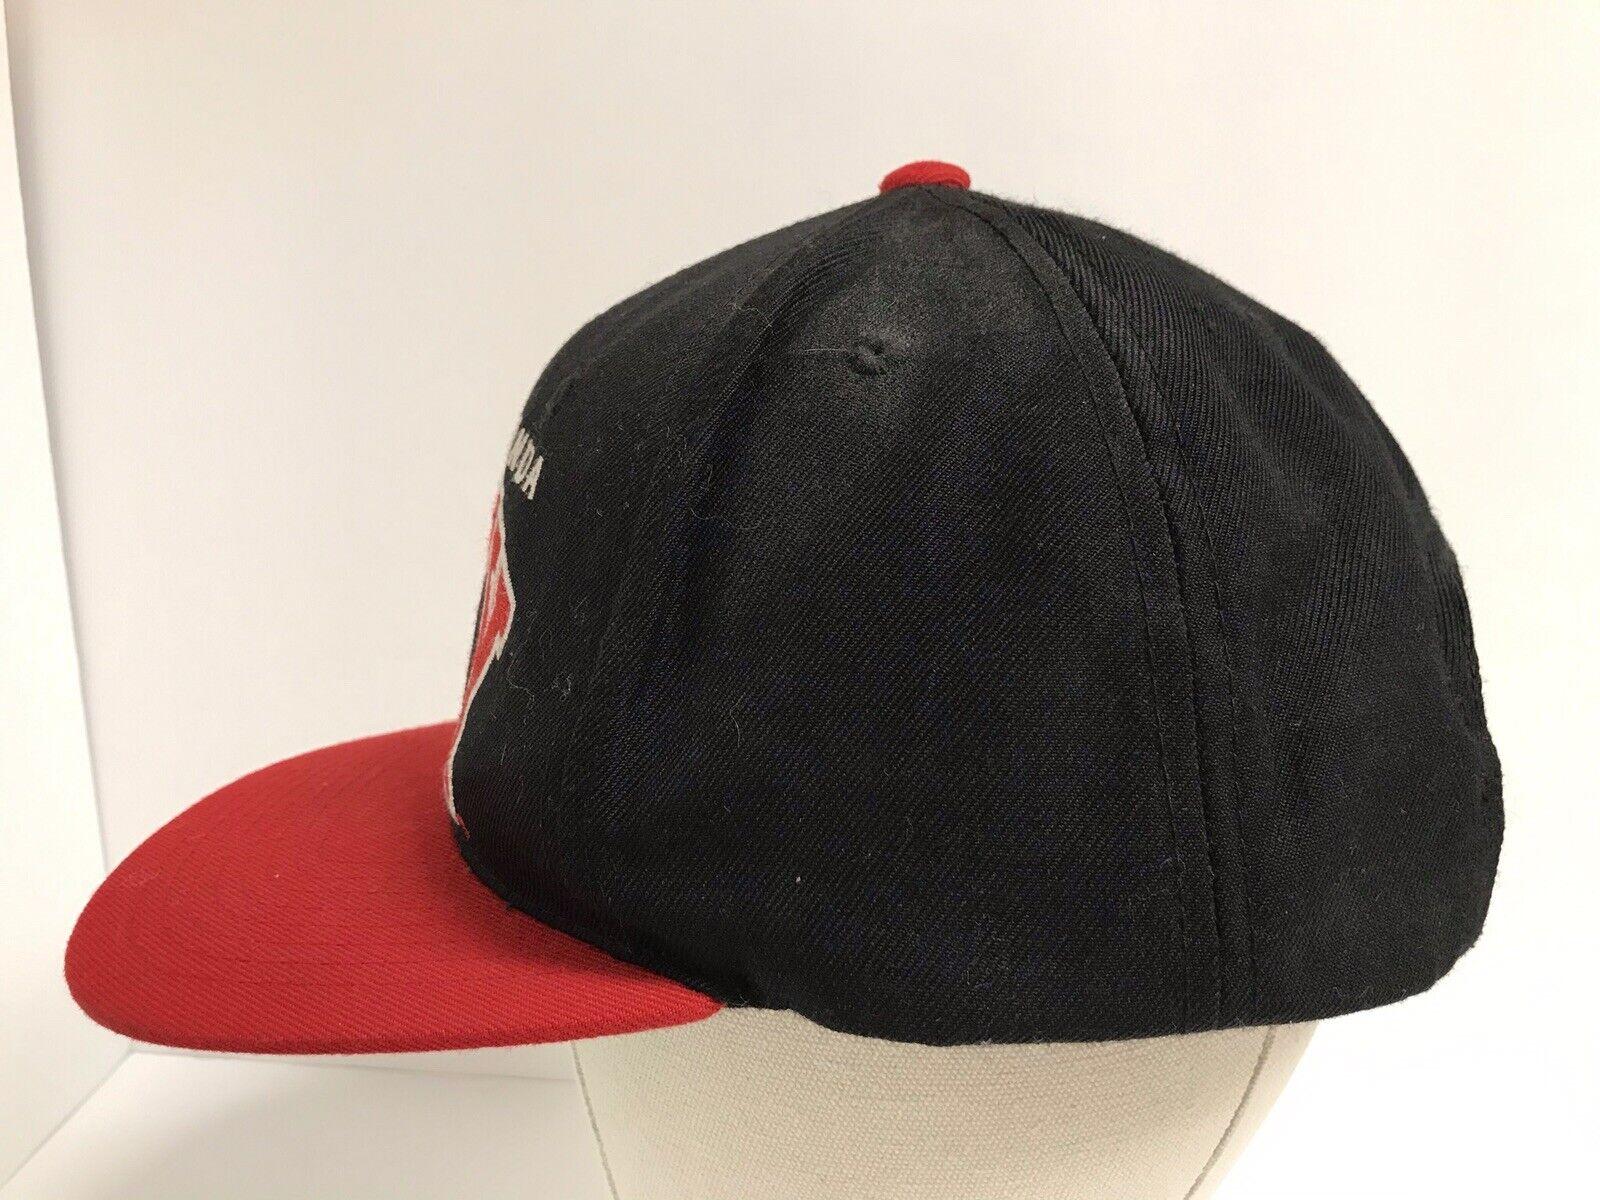 Propaganda Obey Red Black Snapback Hat - image 6